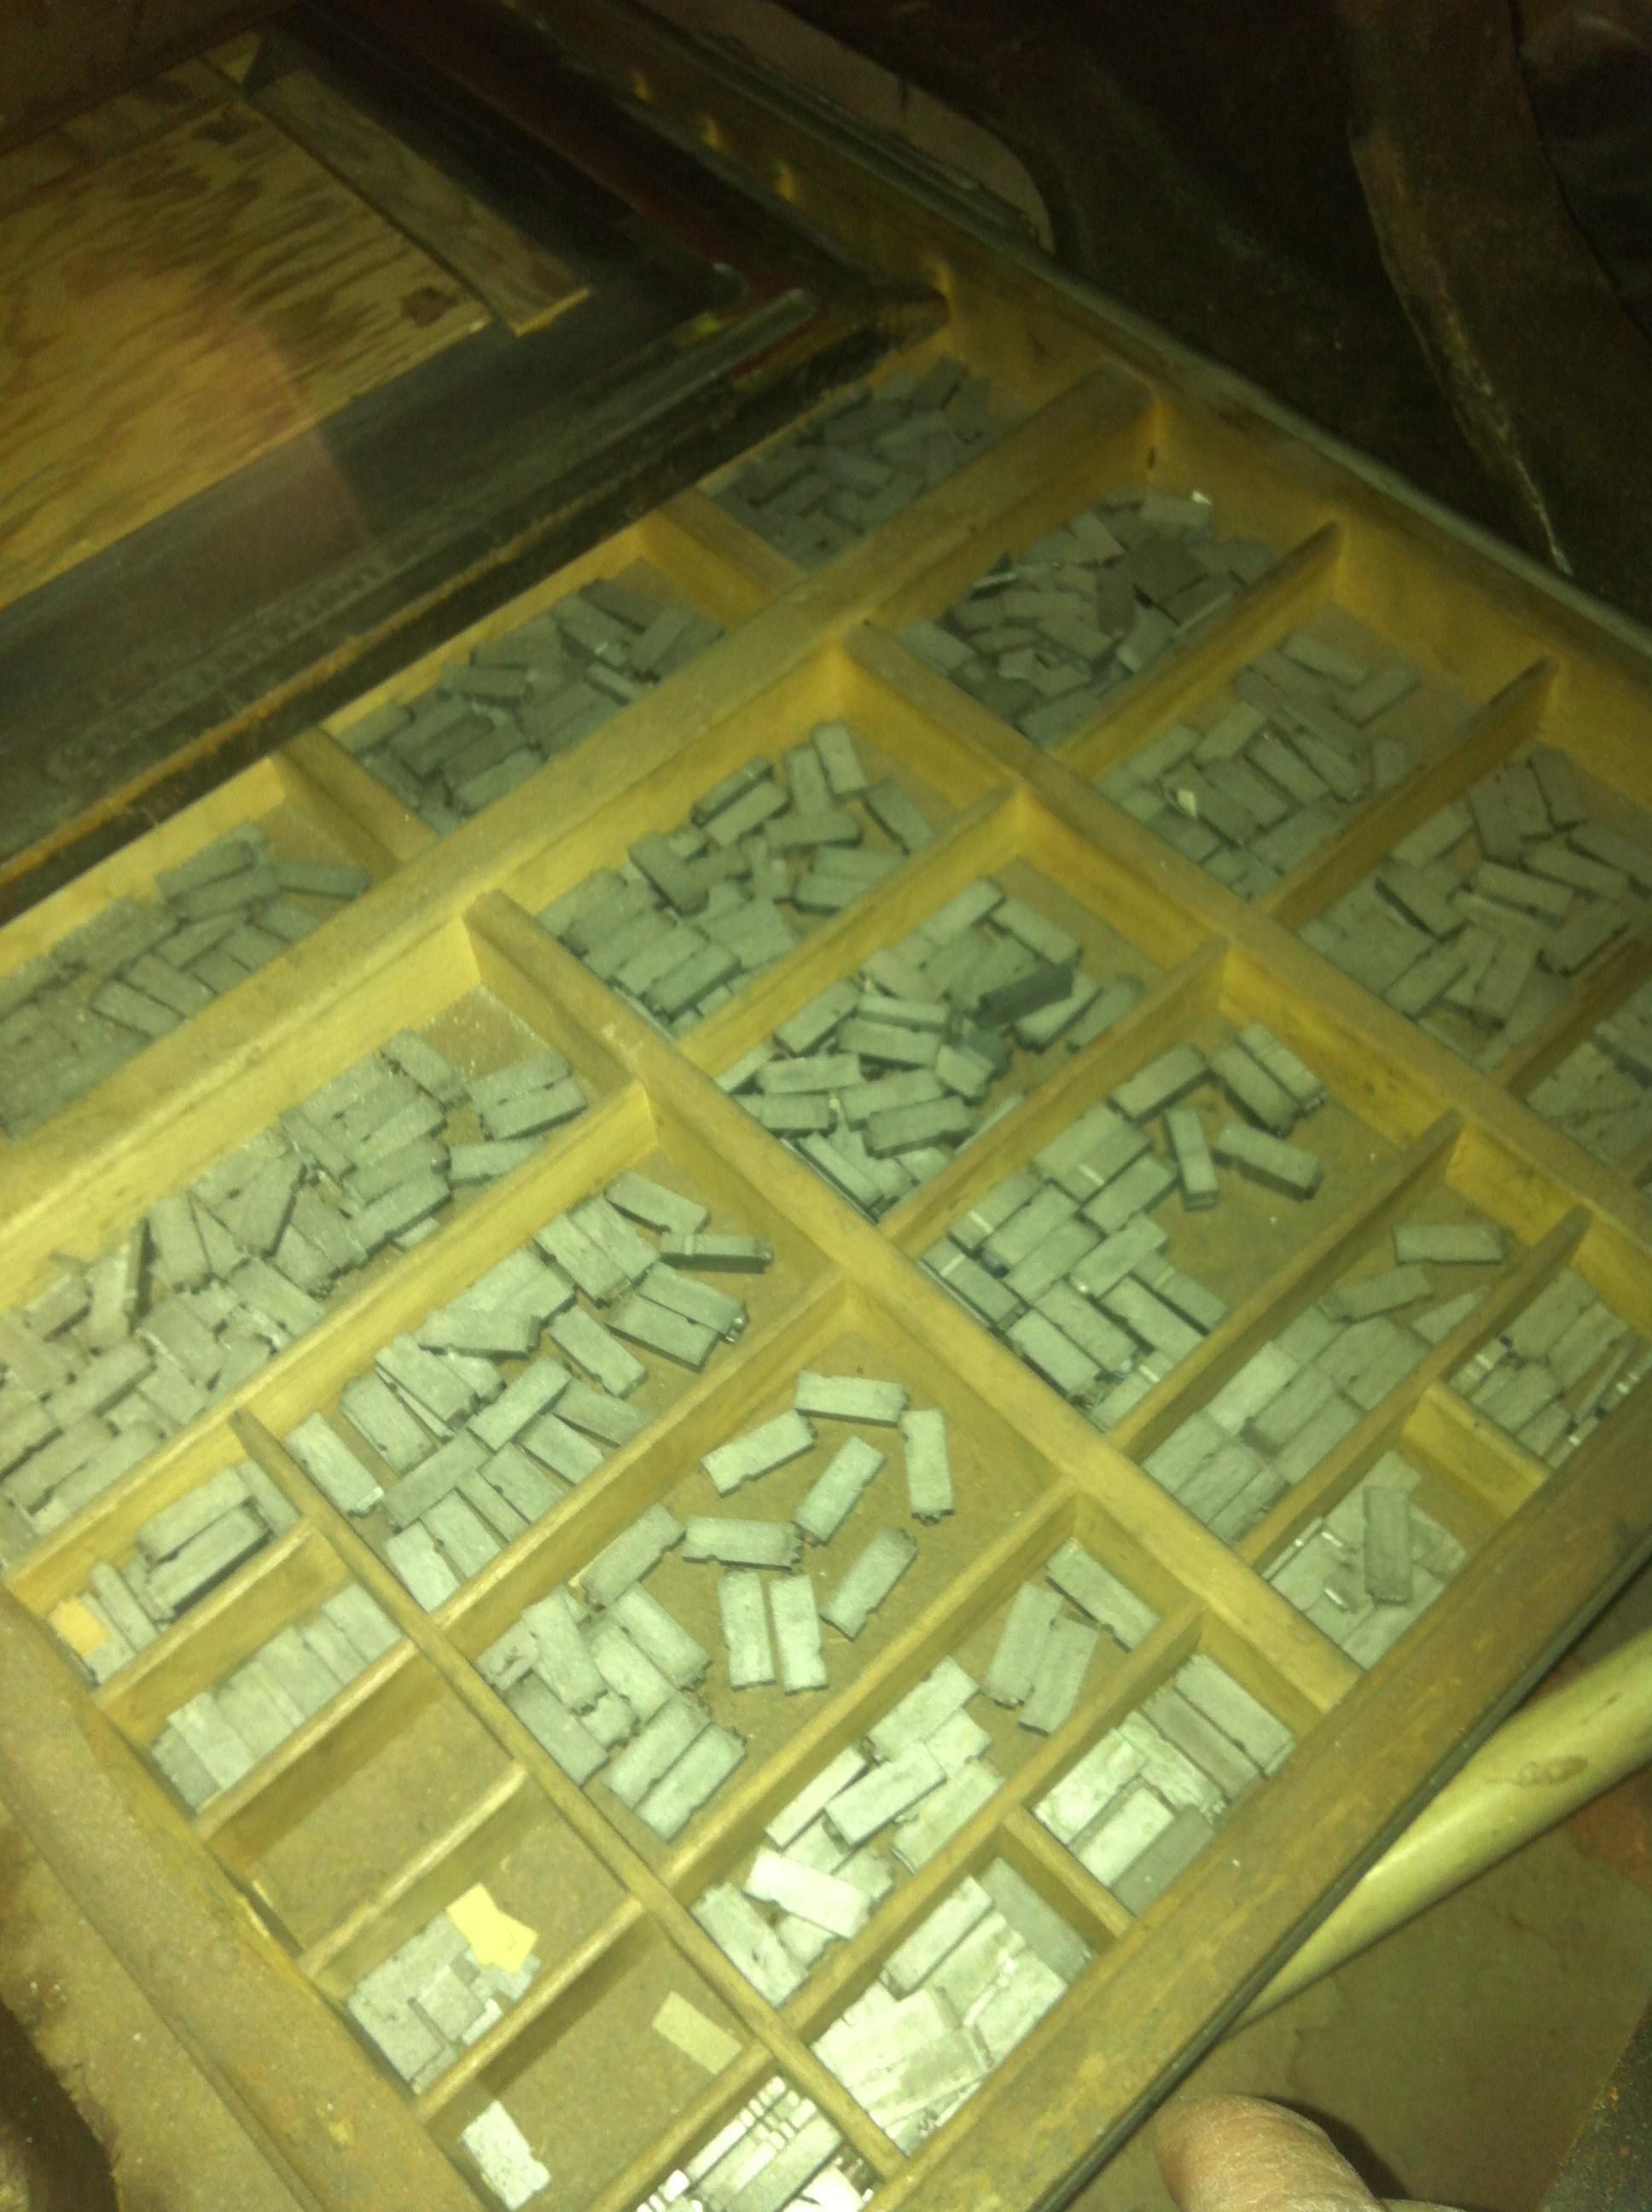 Exploring an Antique Printing Press